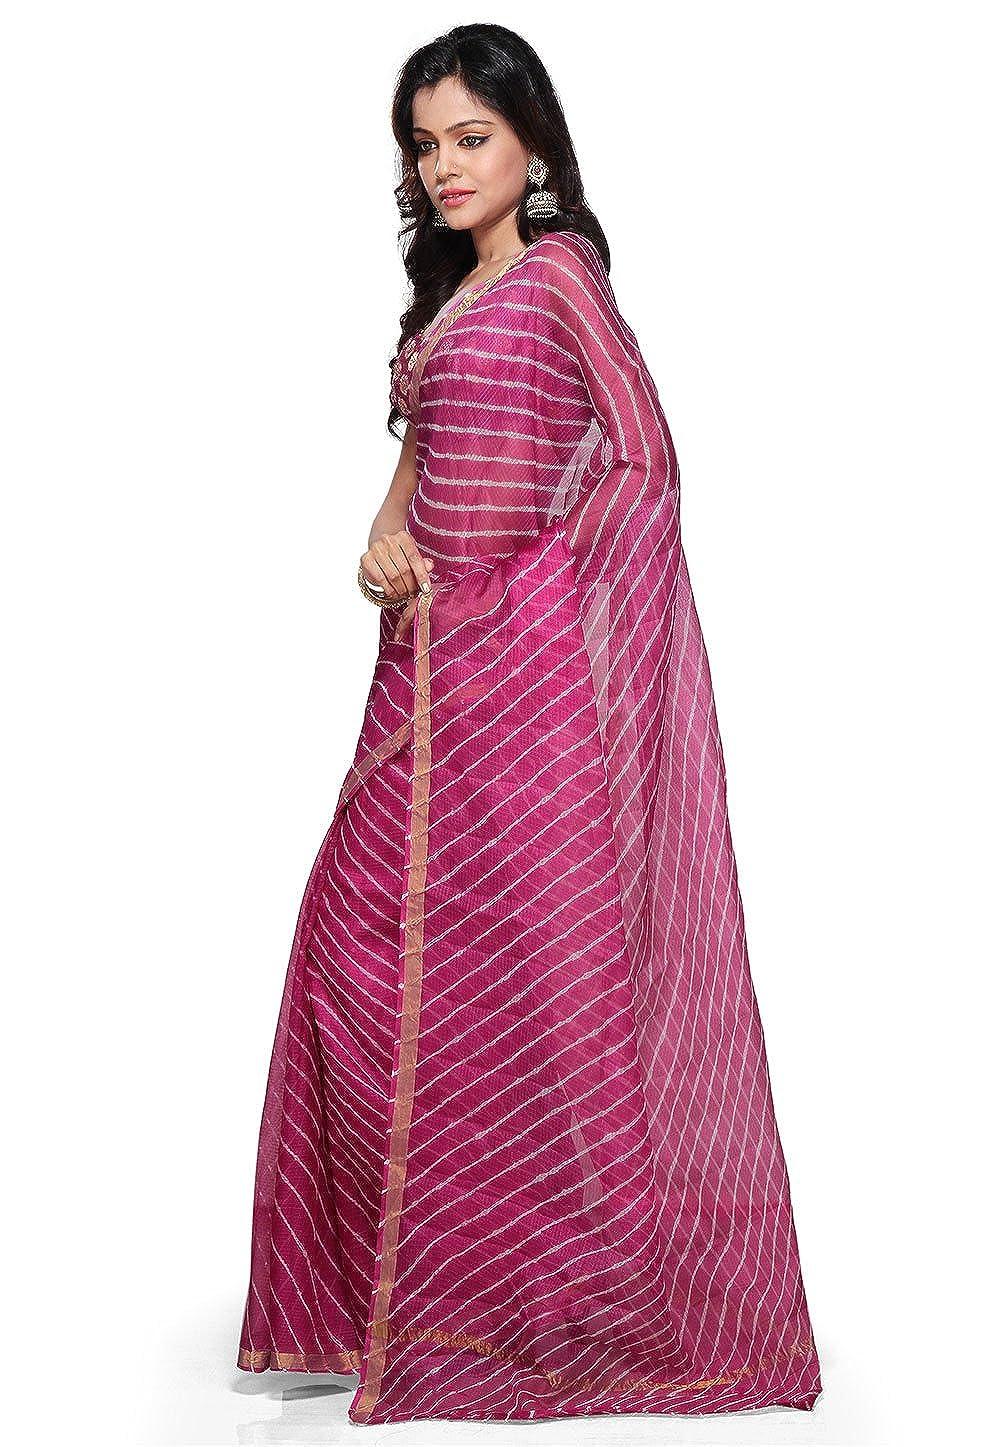 7b693257cd17e Utsav Fashion Pure Kota Silk Saree in Fuchsia Colour  Amazon.in  Clothing    Accessories